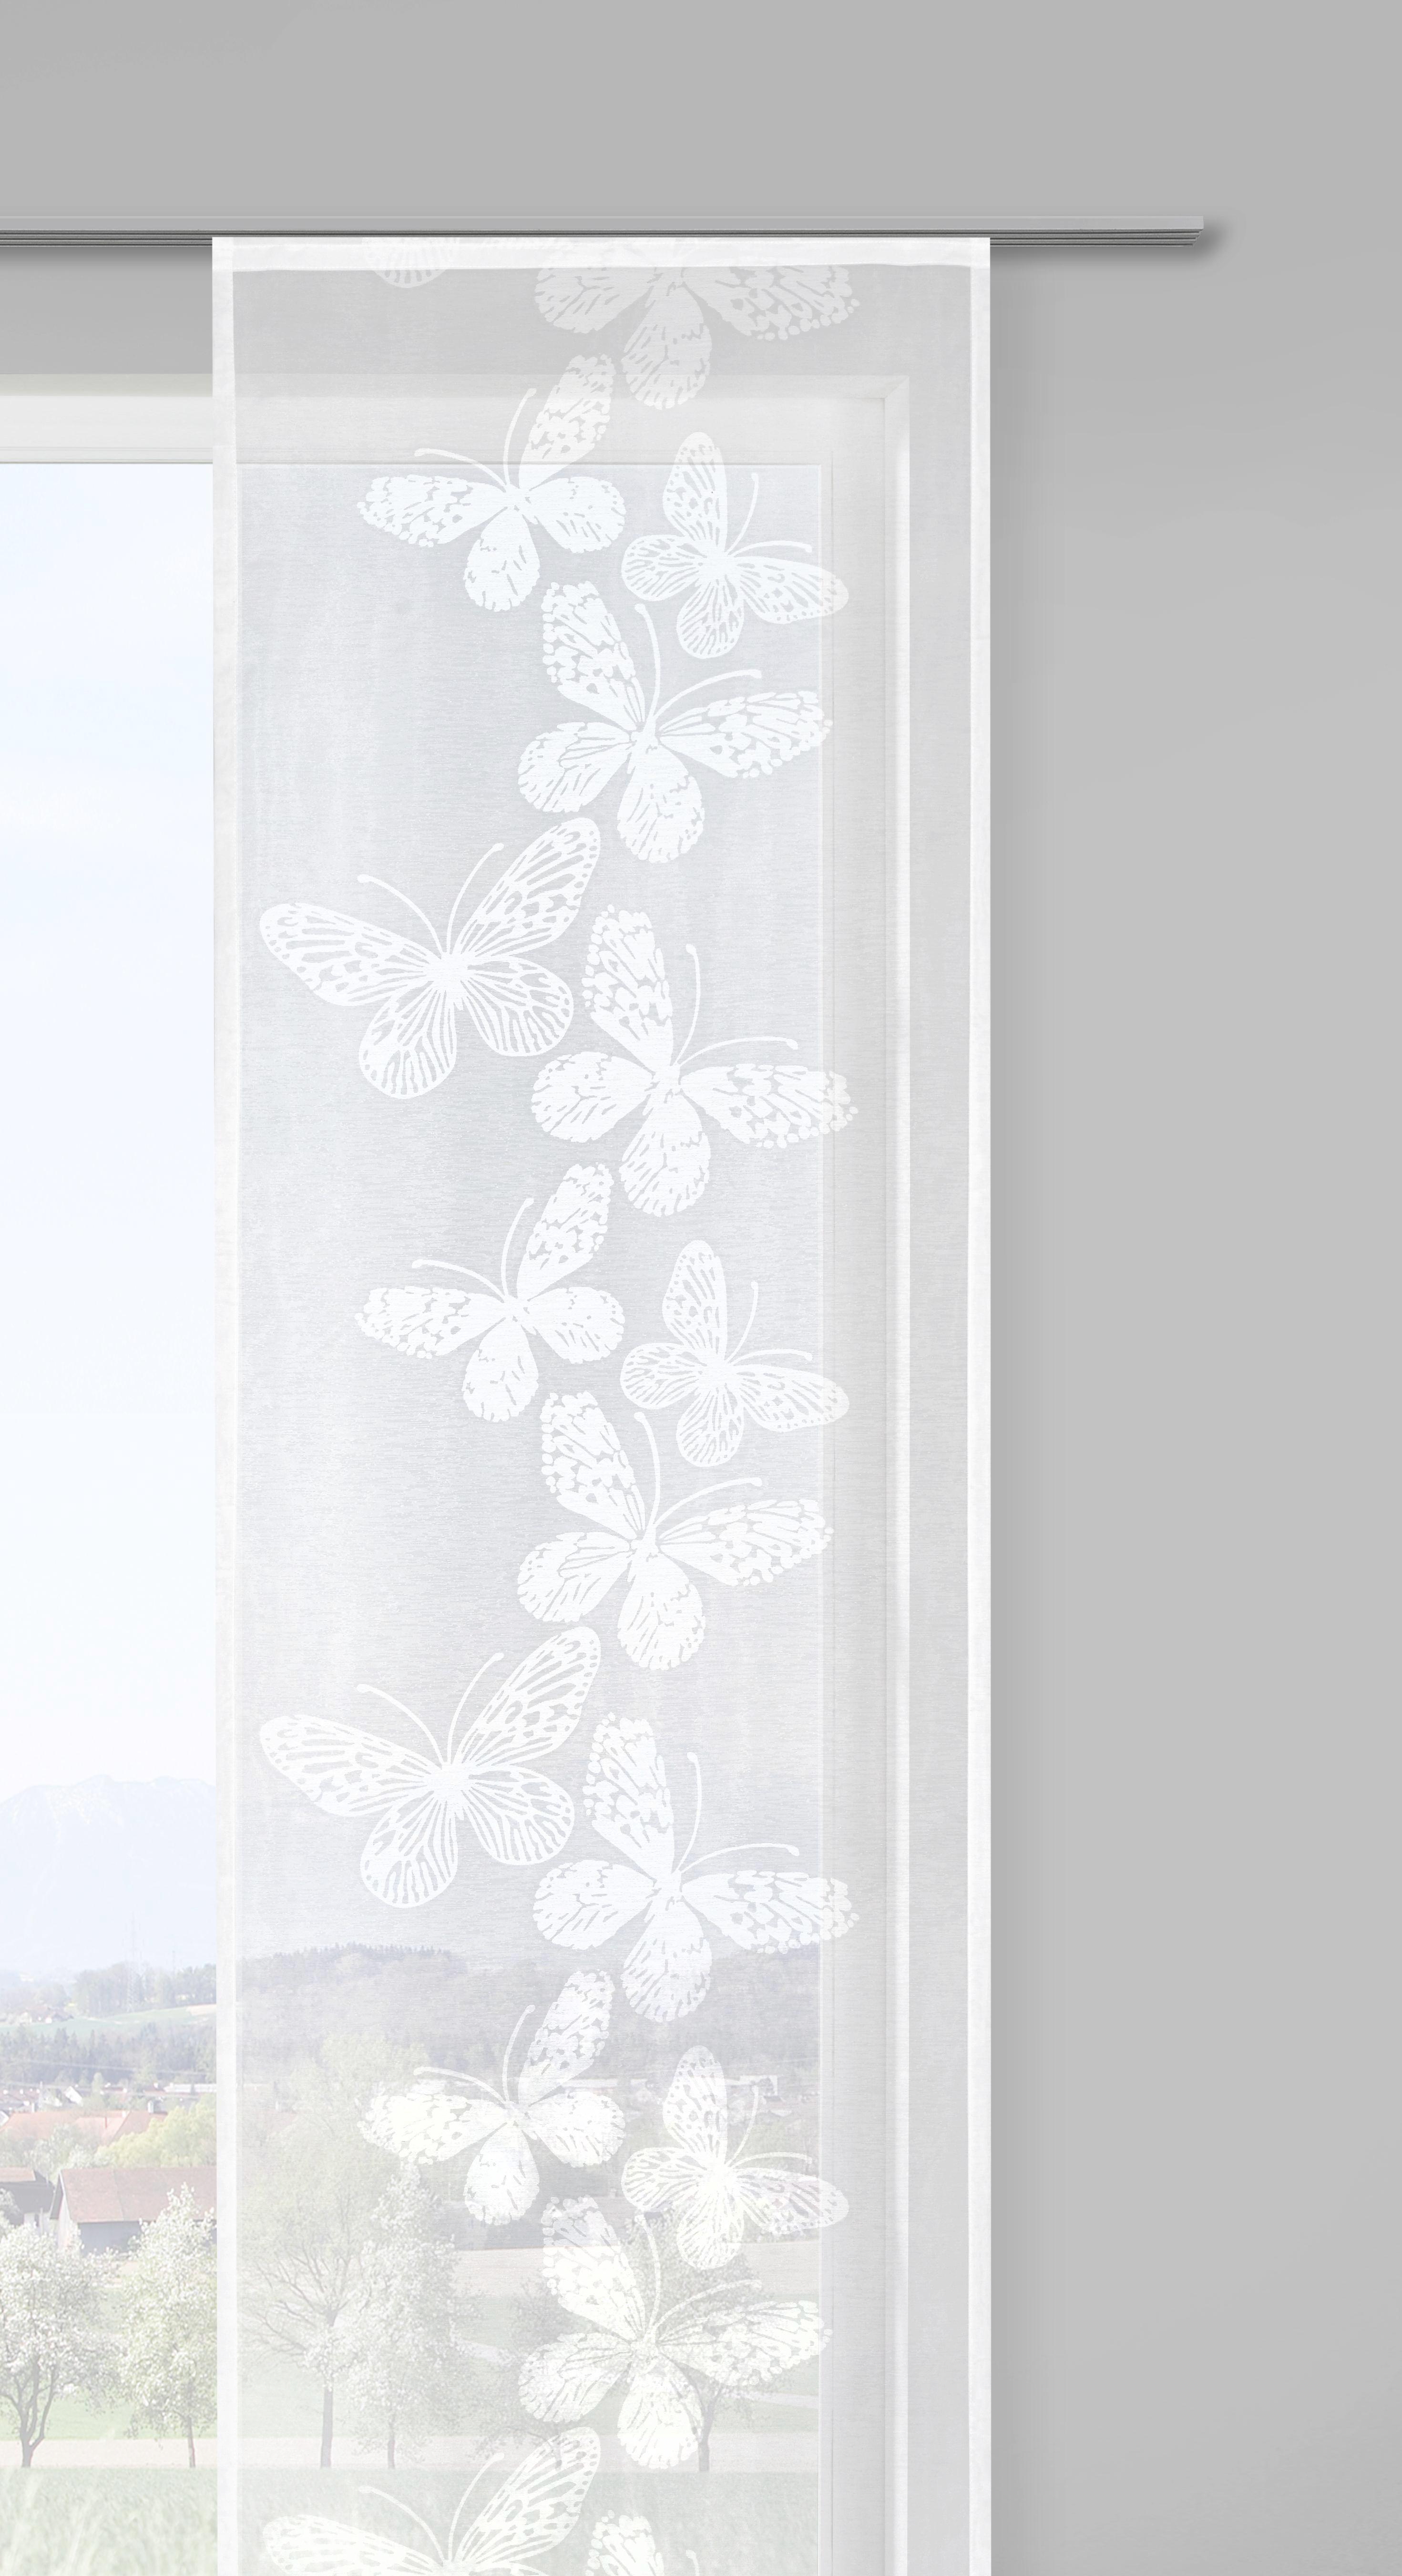 Flächenvorhang Papillon, ca. 60x245cm - Weiß, ROMANTIK / LANDHAUS, Textil (60/245cm) - MÖMAX modern living